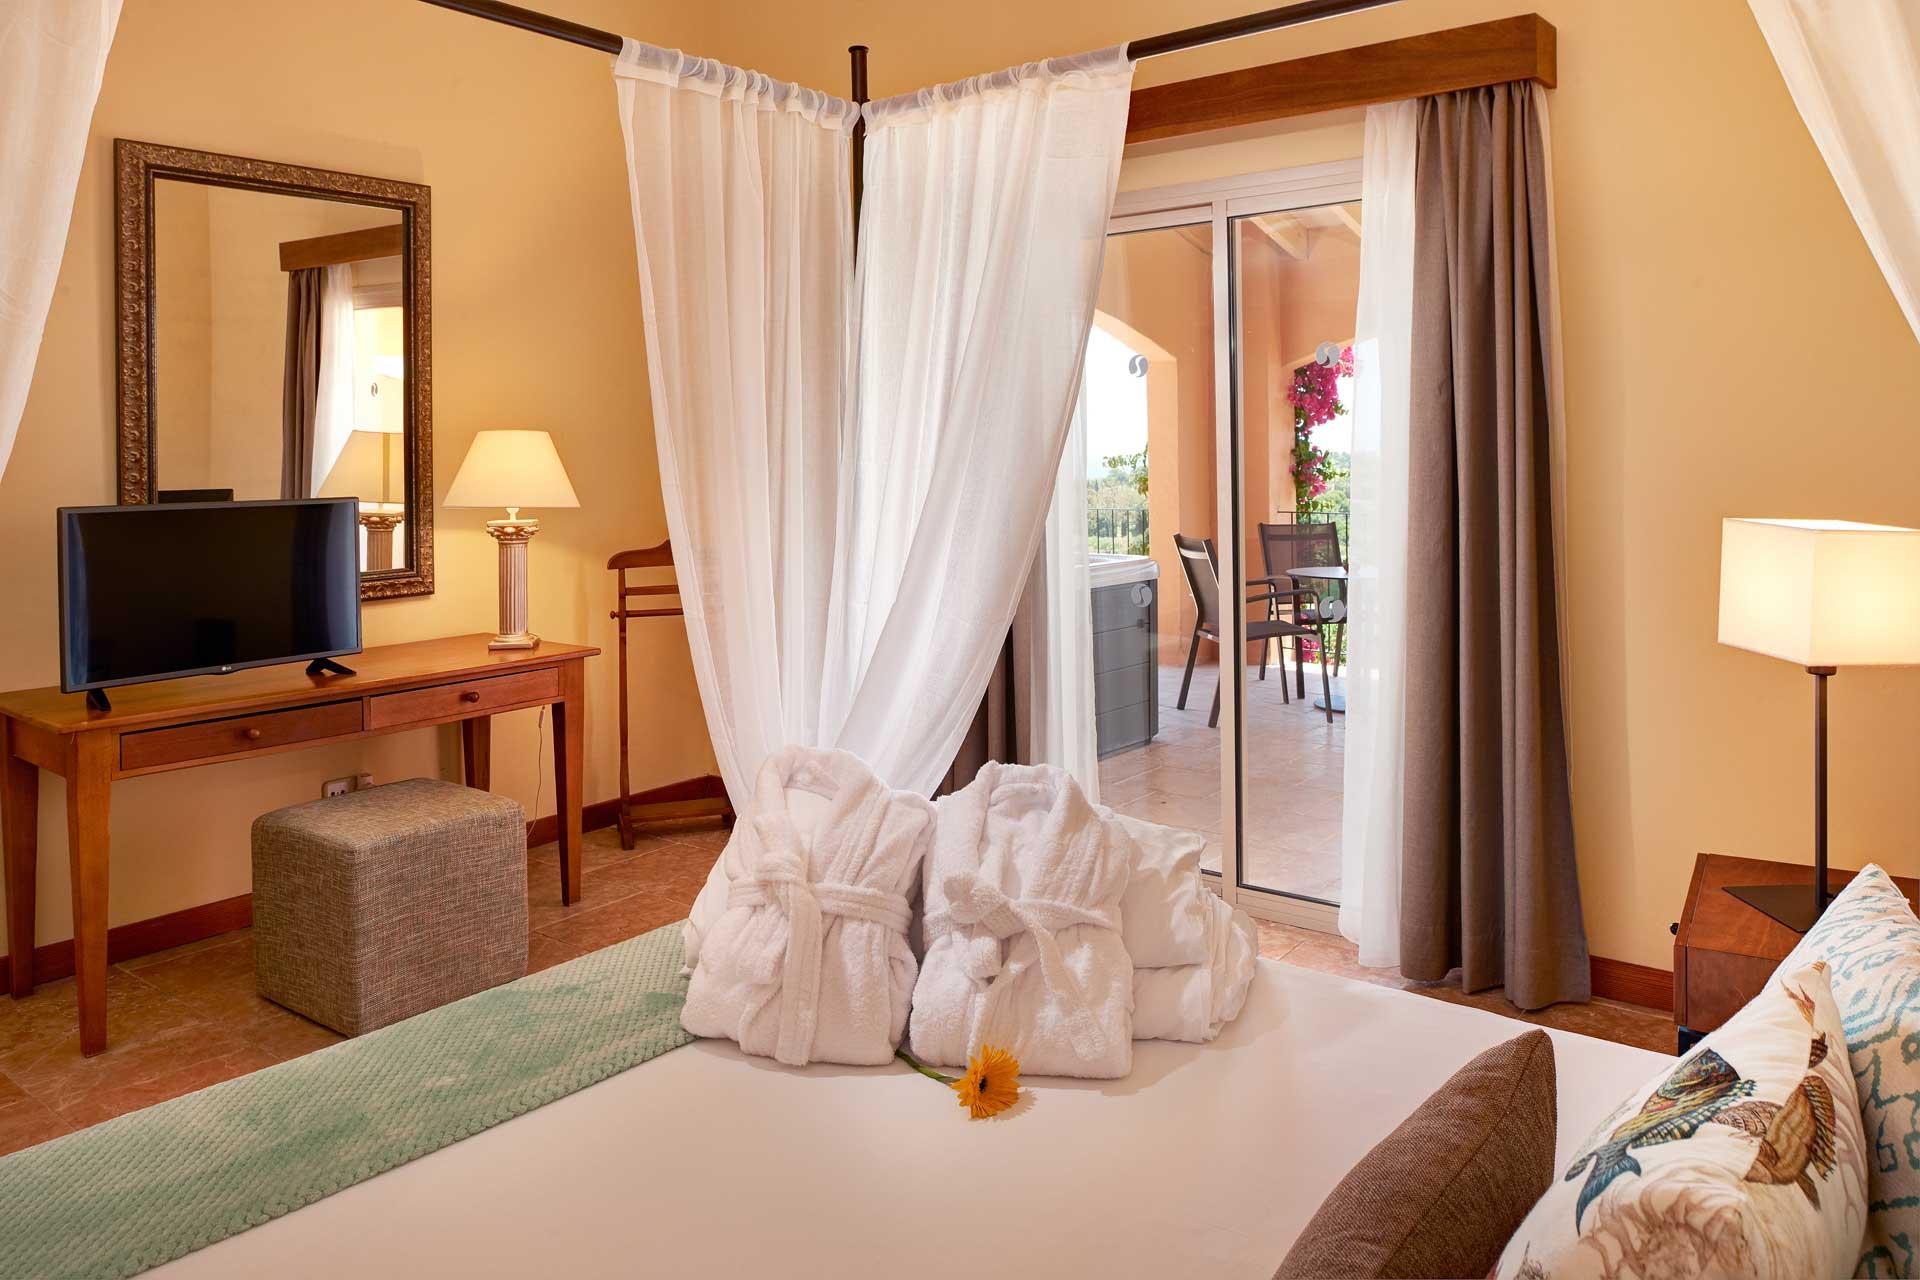 Finca-Hotel Sentido Pula Suites - Superior Suite de Luxe